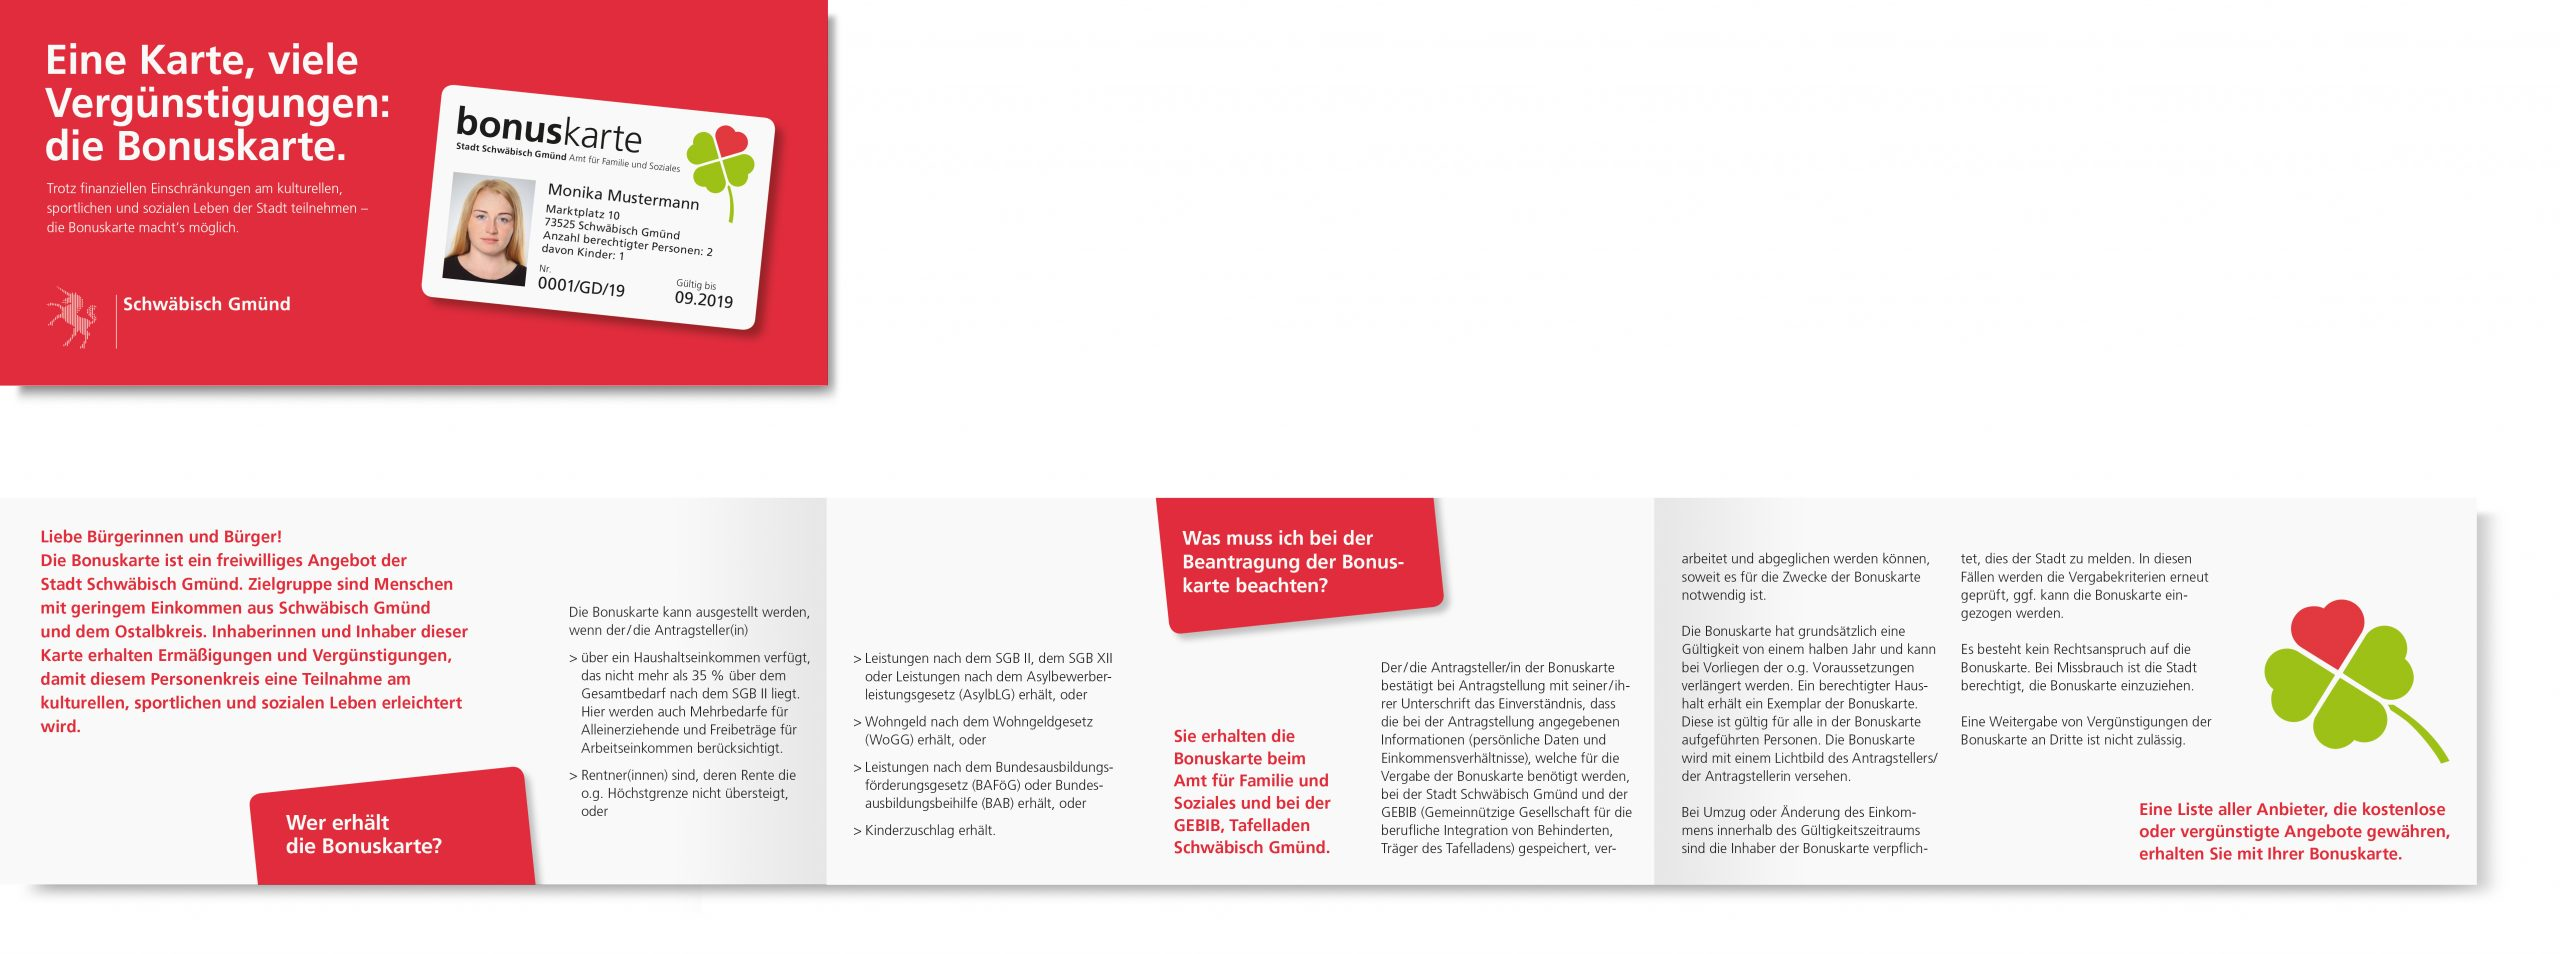 fh-web-flyer-bonuskarte-nutzer-scaled.jpg